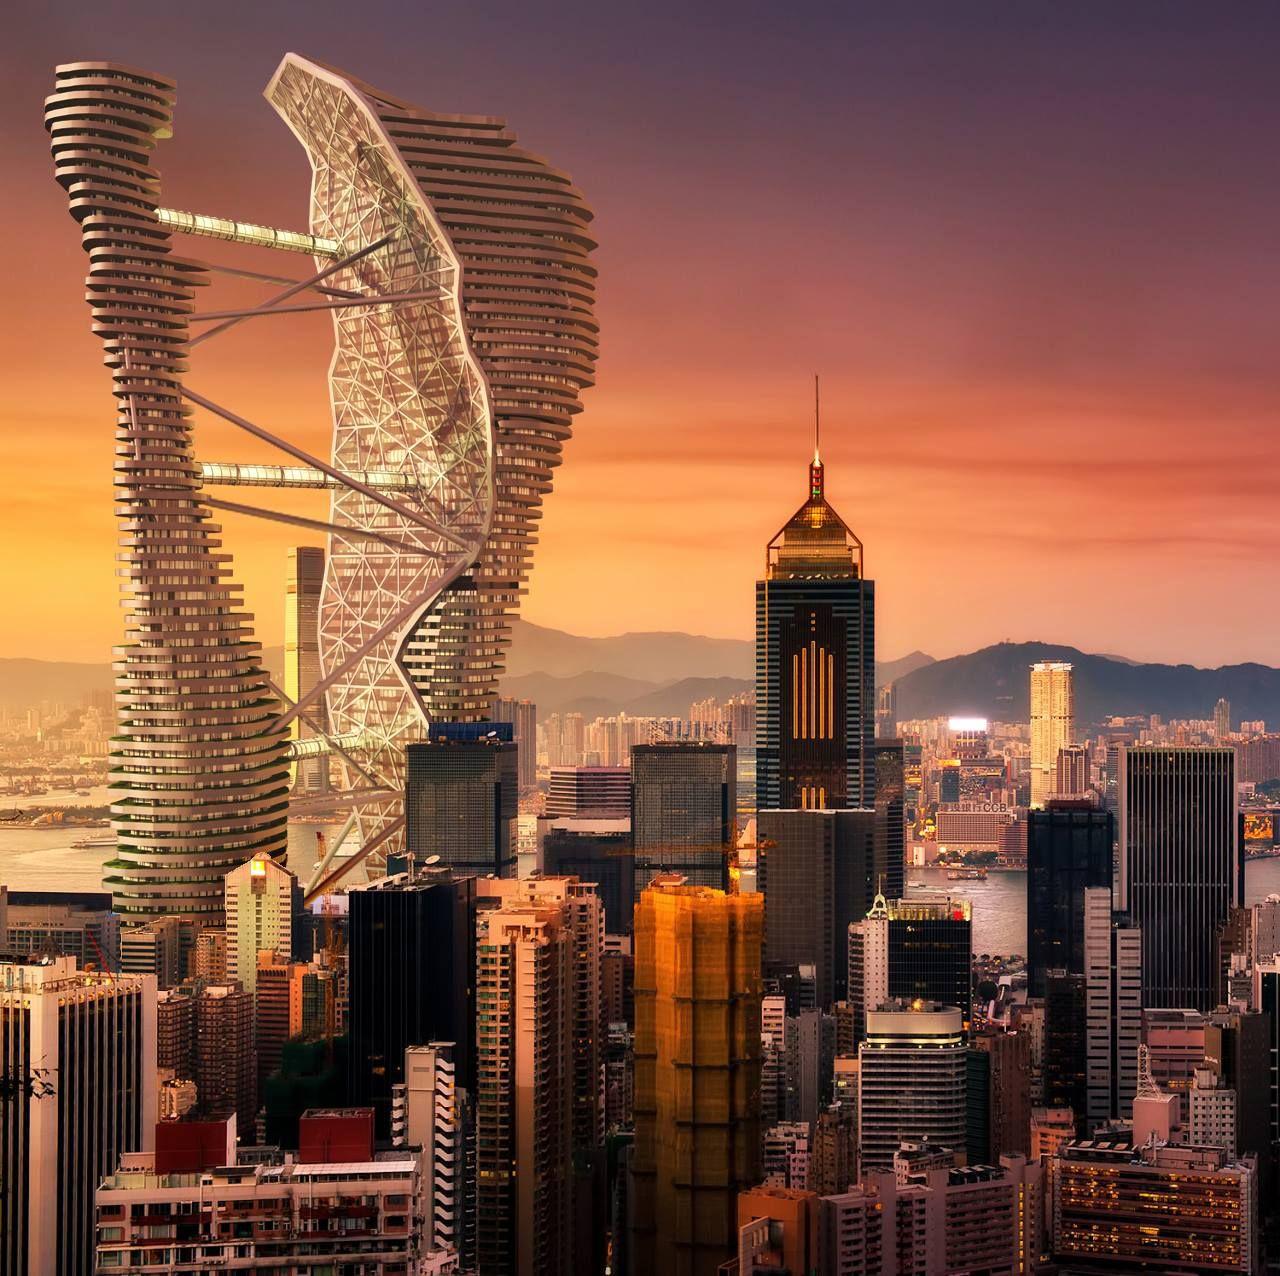 Skyscraper proposal